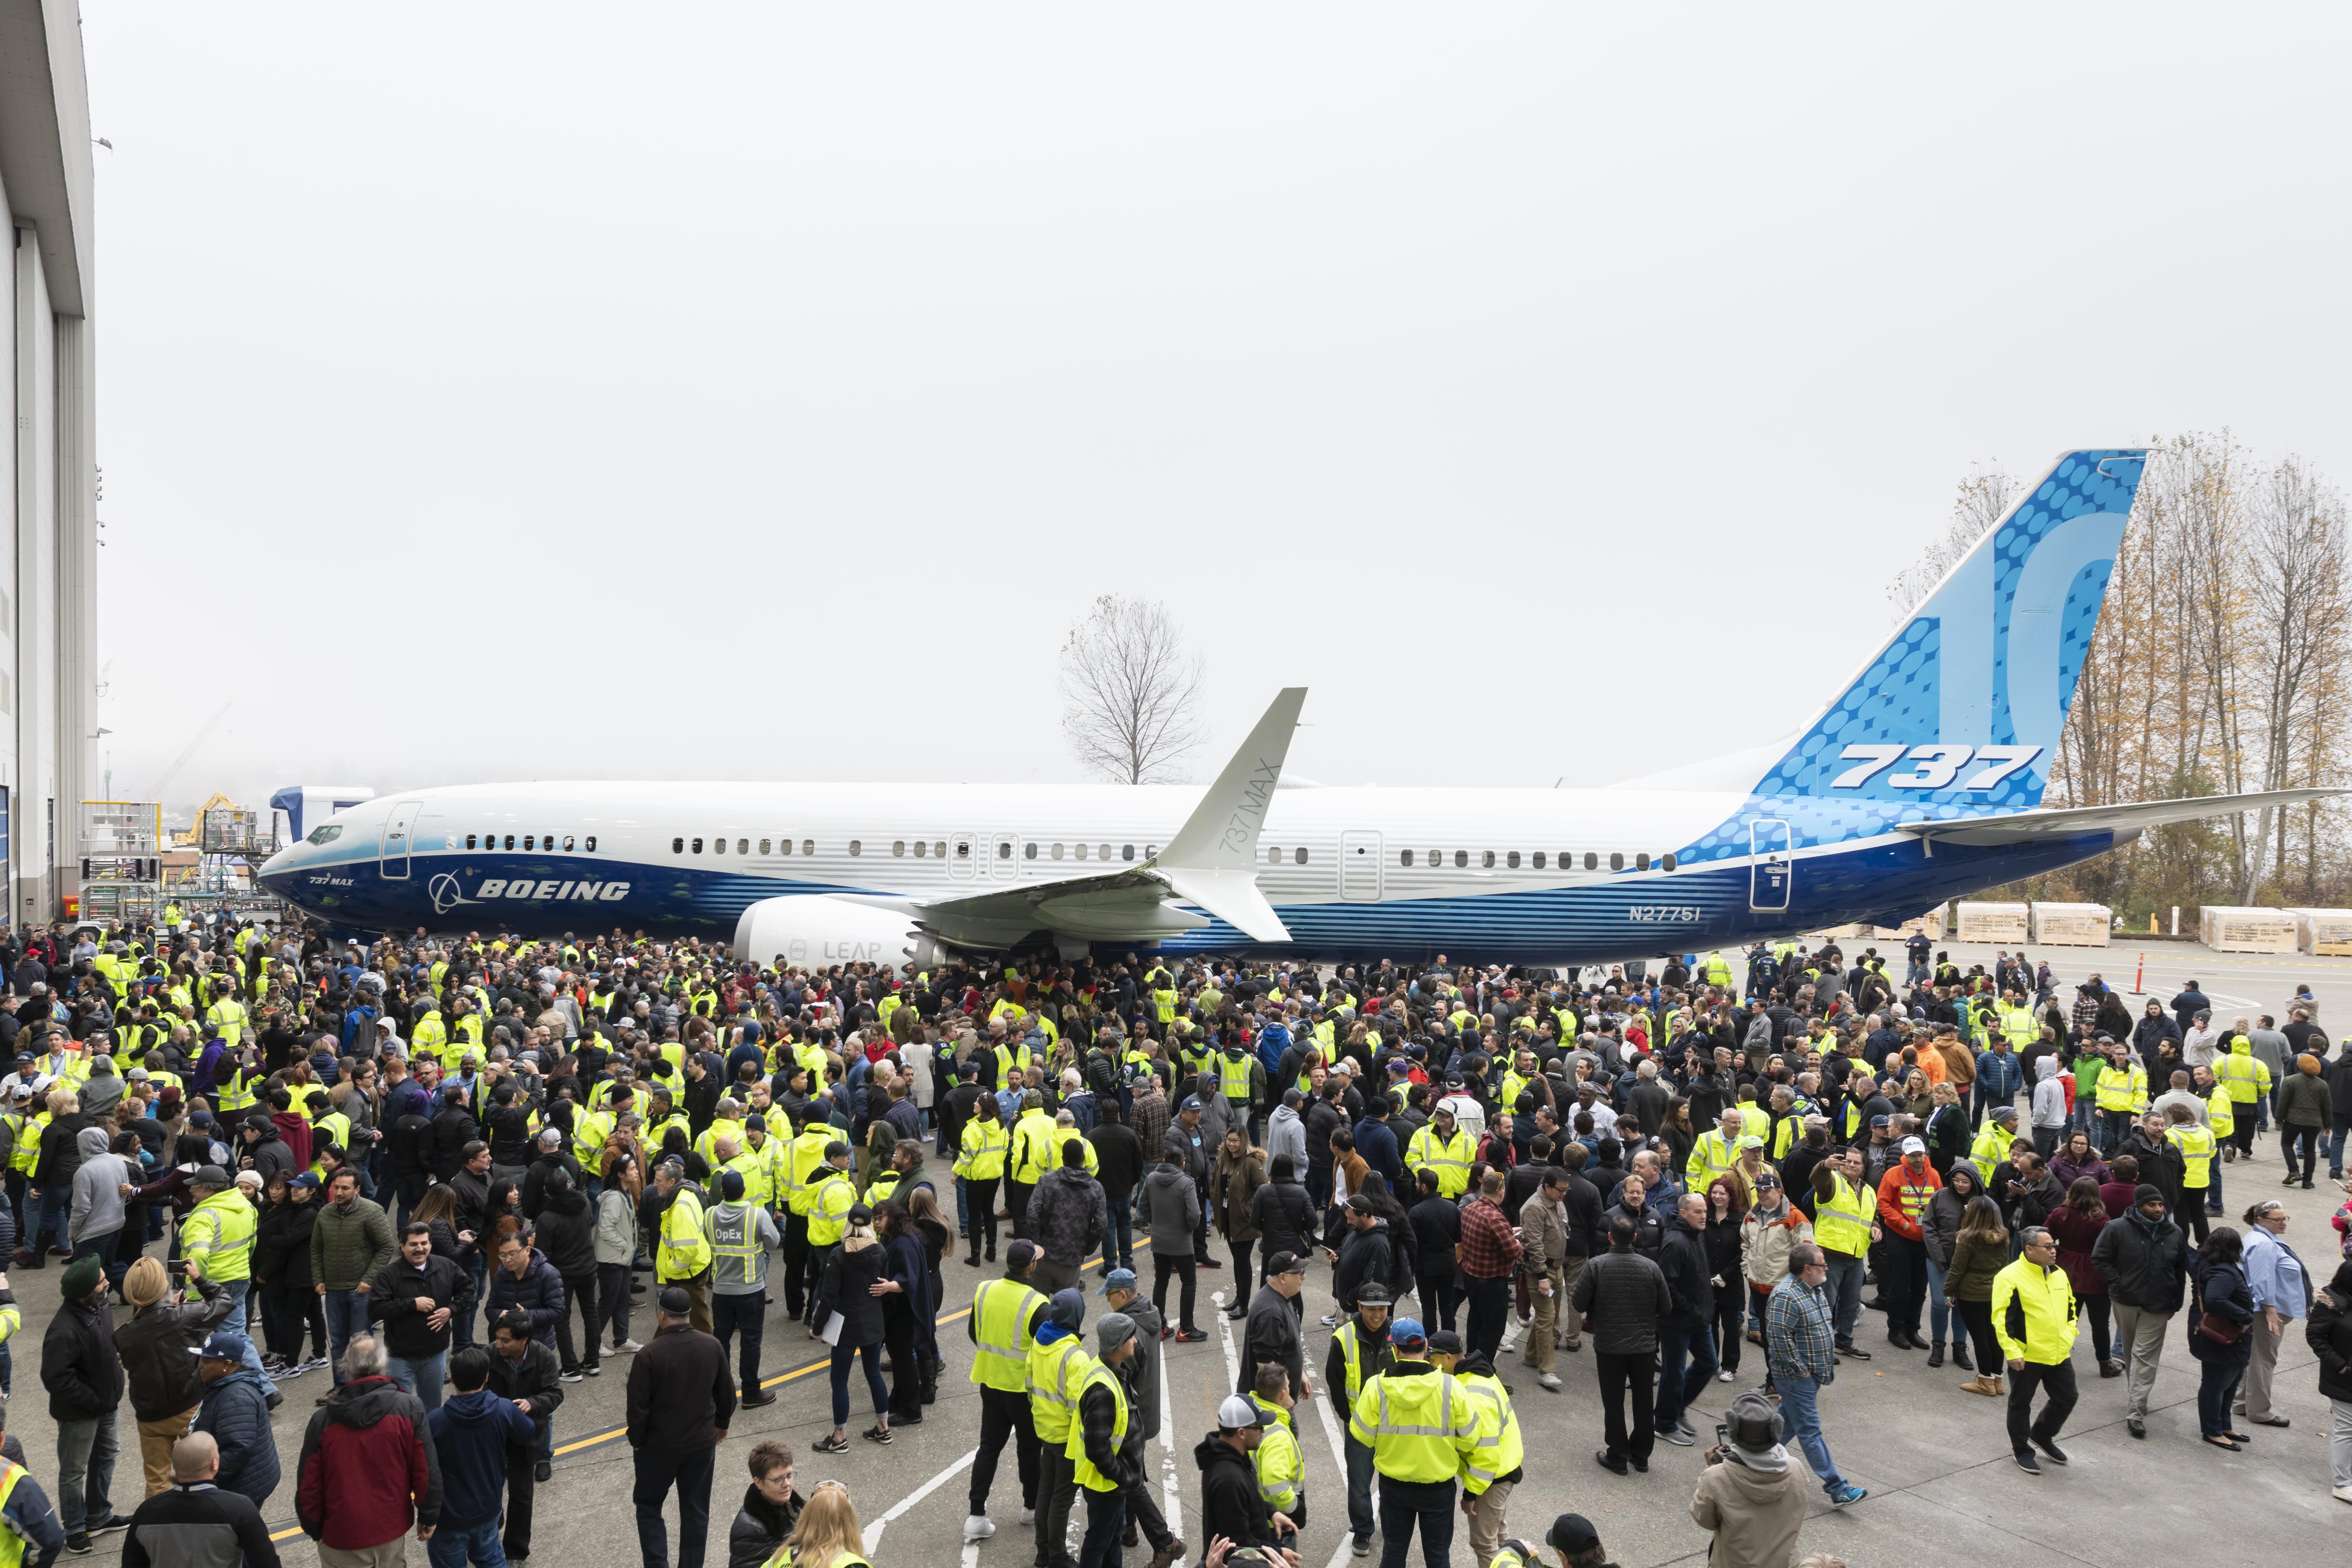 Boeing unveils largest version of its embattled 737 Max plane, despite crisis